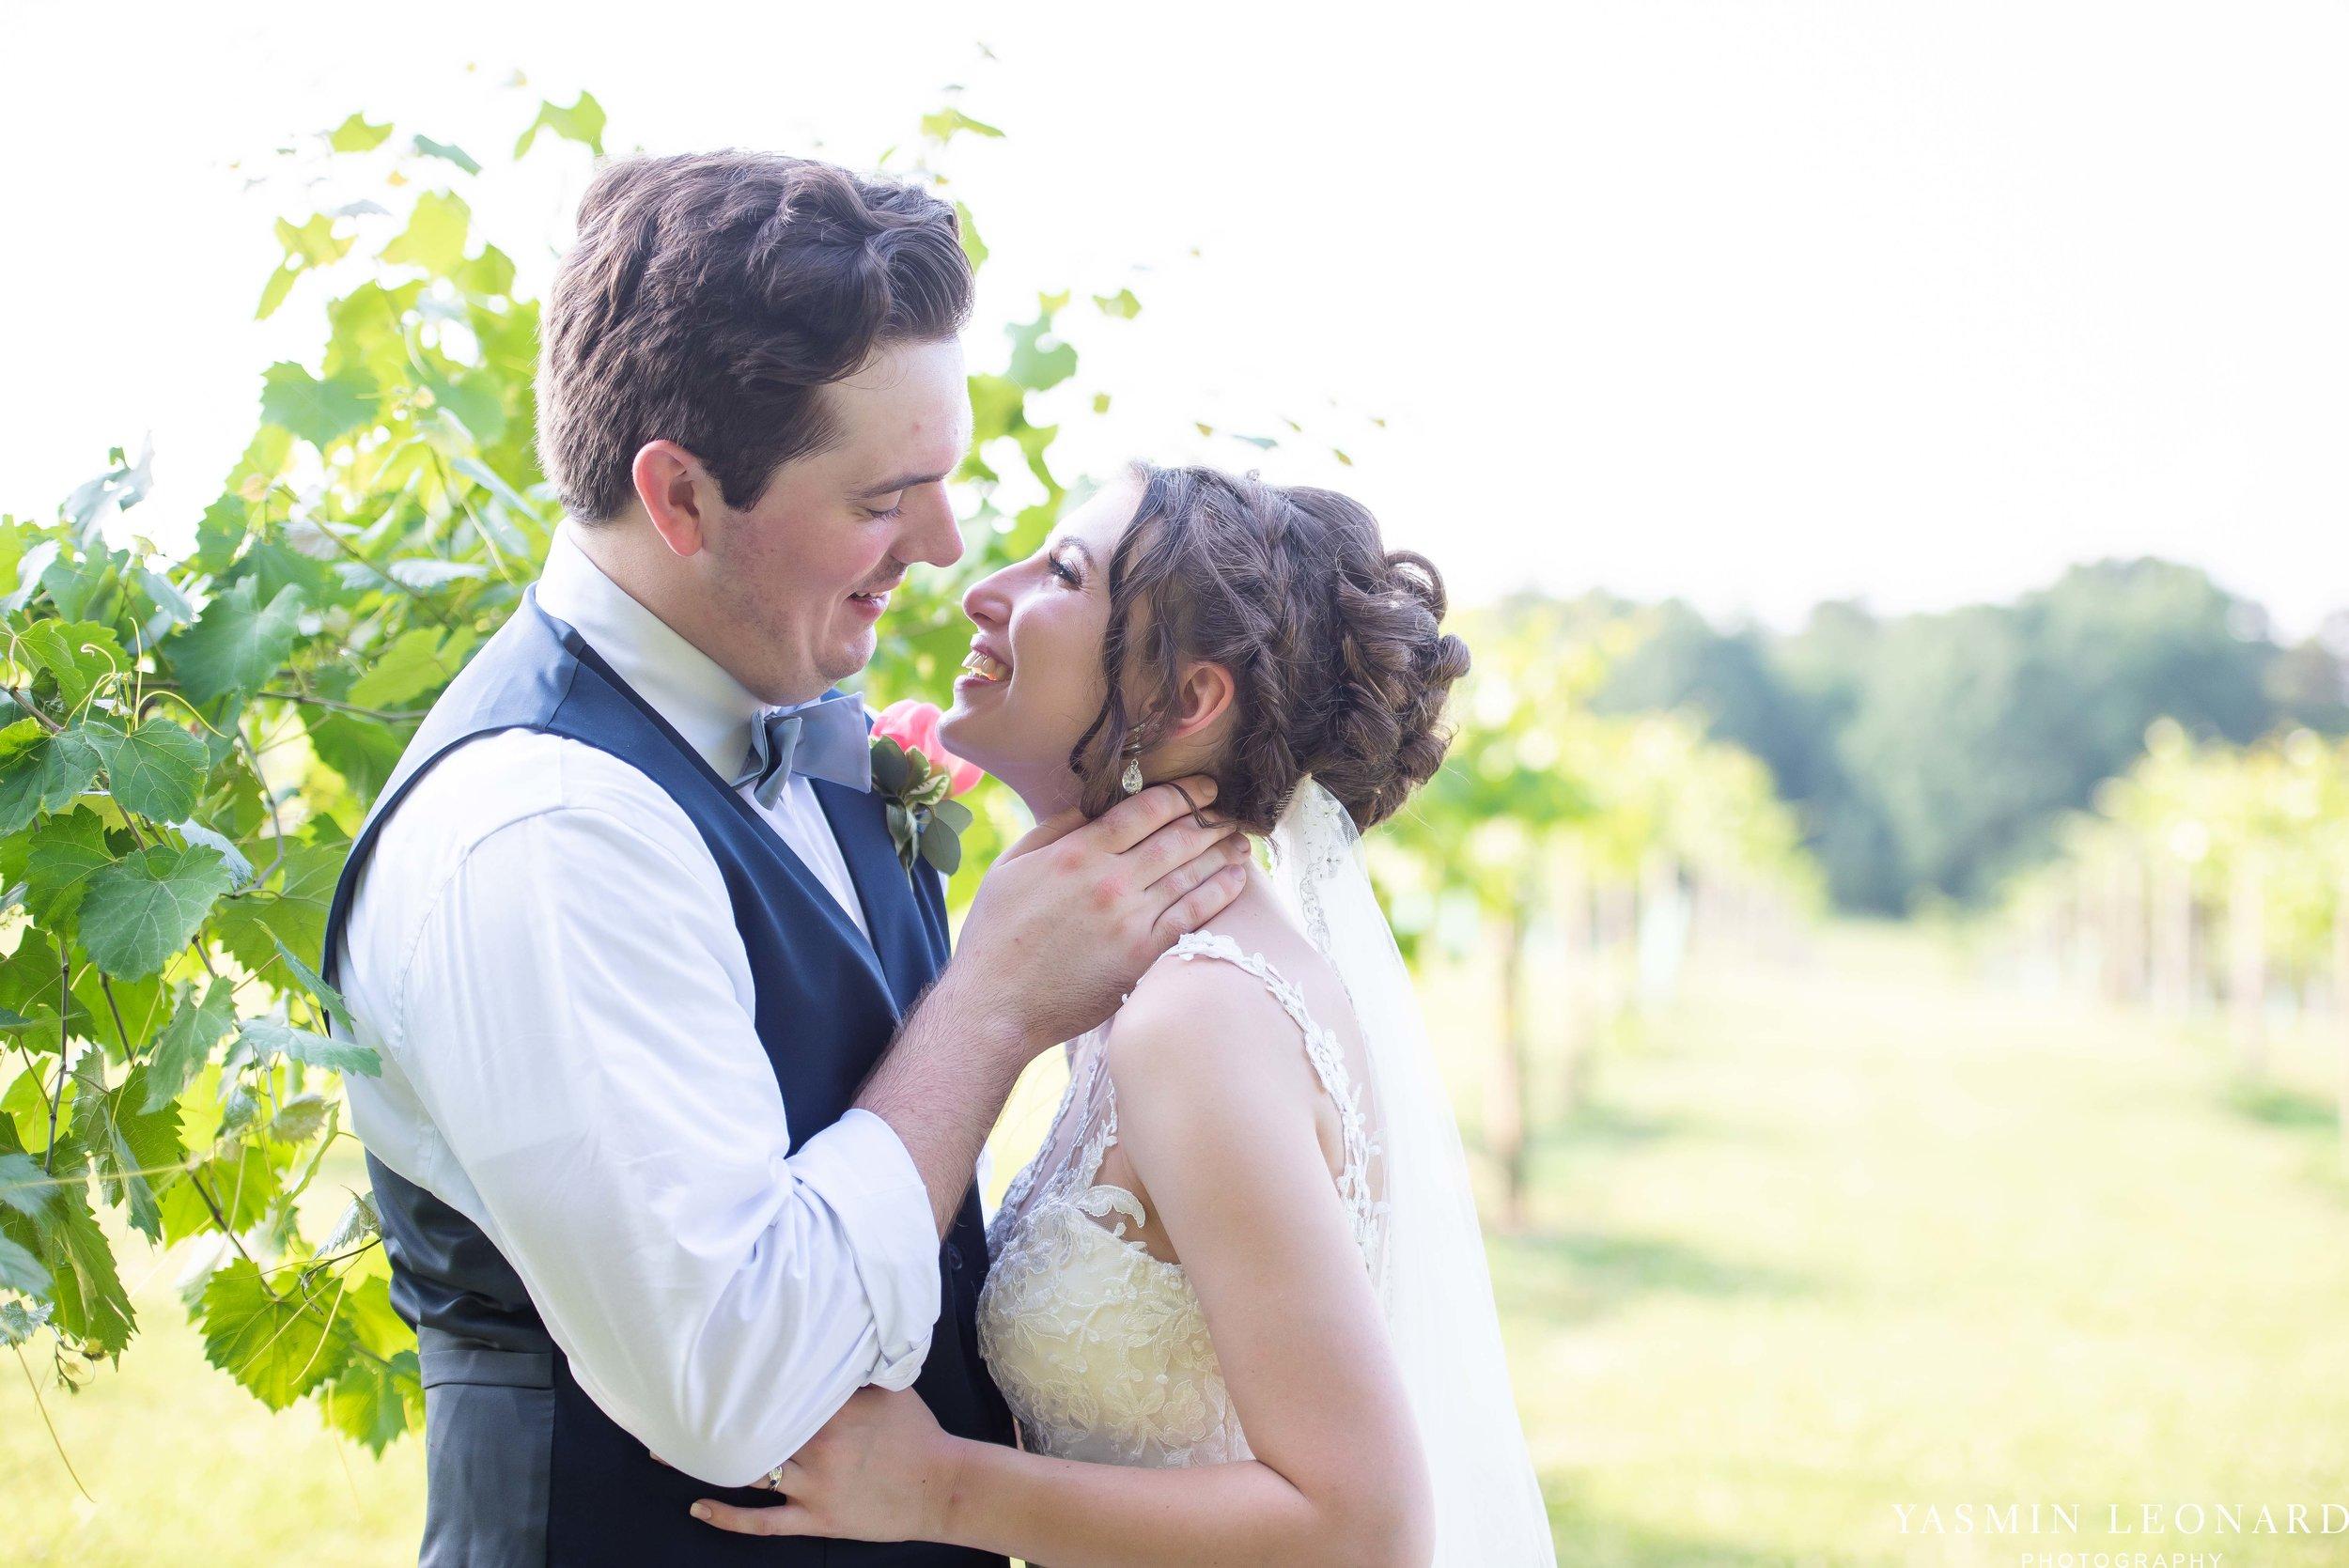 Old Homeplace Vineyard - NC Weddings - Outdoor Summer Weddings - Peony Boutique - Vineyard Wedding - NC Photographer - Yasmin Leonard Photography-43.jpg